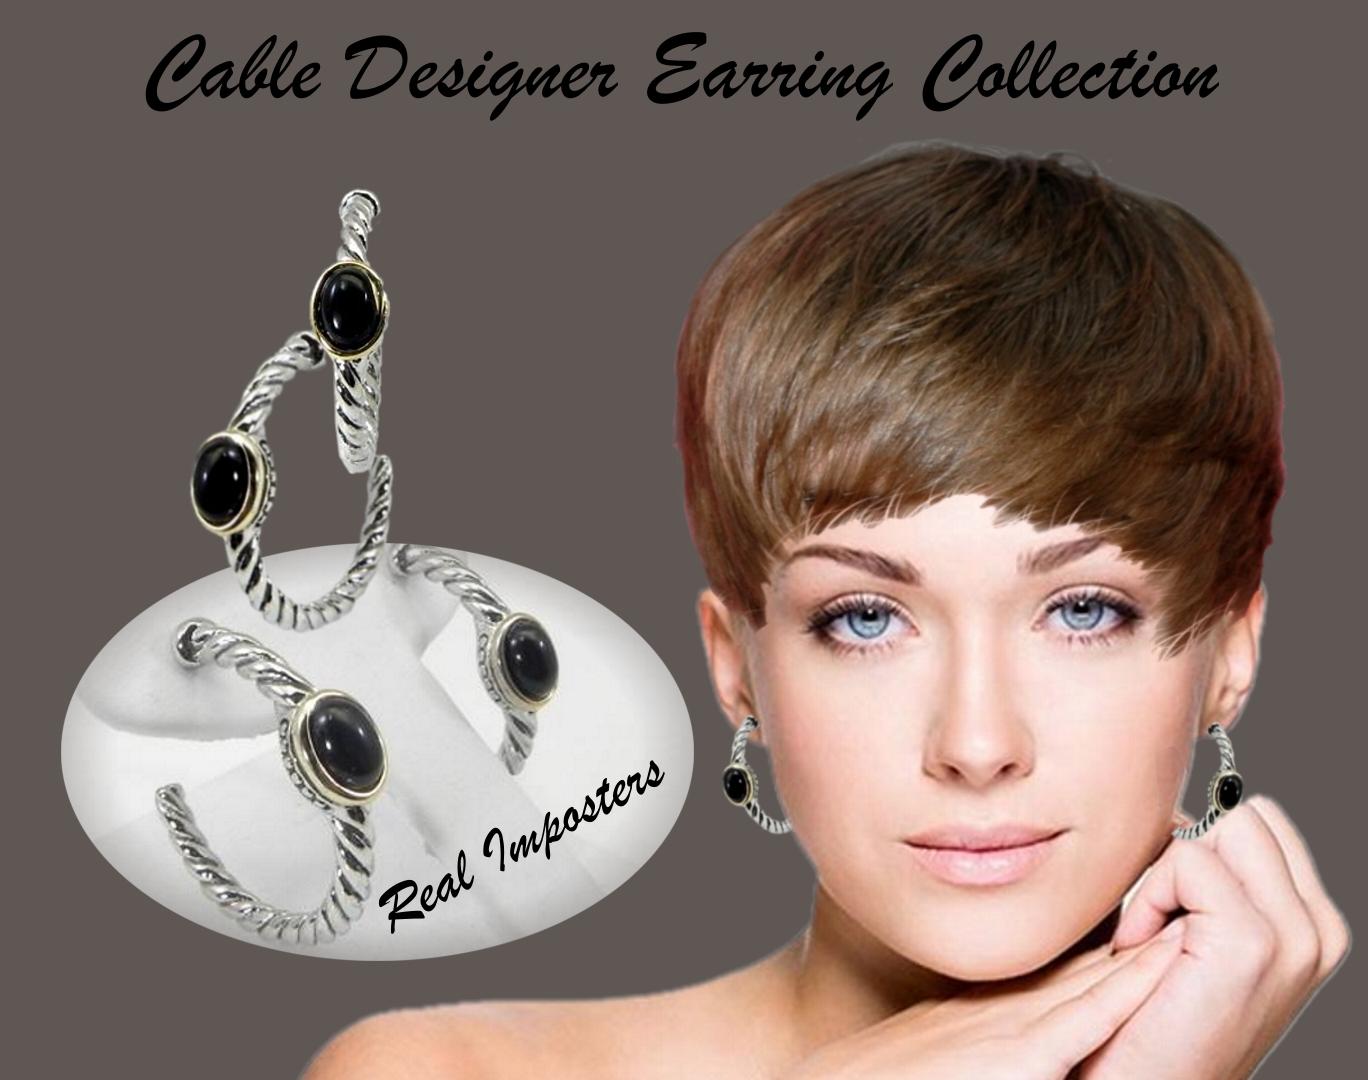 e216_hoop_cable_w_model